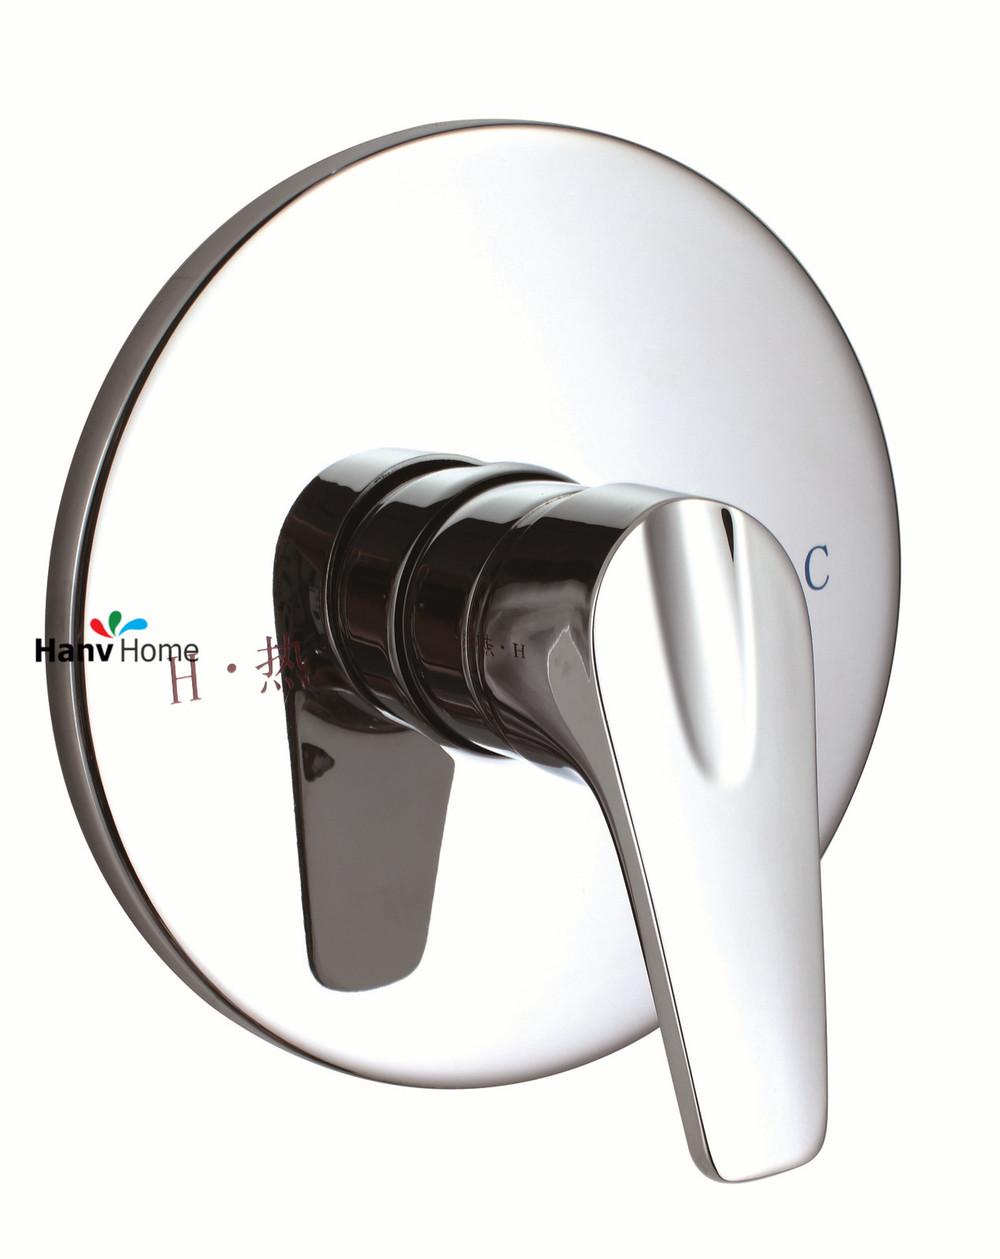 Hot &amp; Cold Mixer Valve - for shower head or bidet sprayer  diverter  11-094-04<br><br>Aliexpress